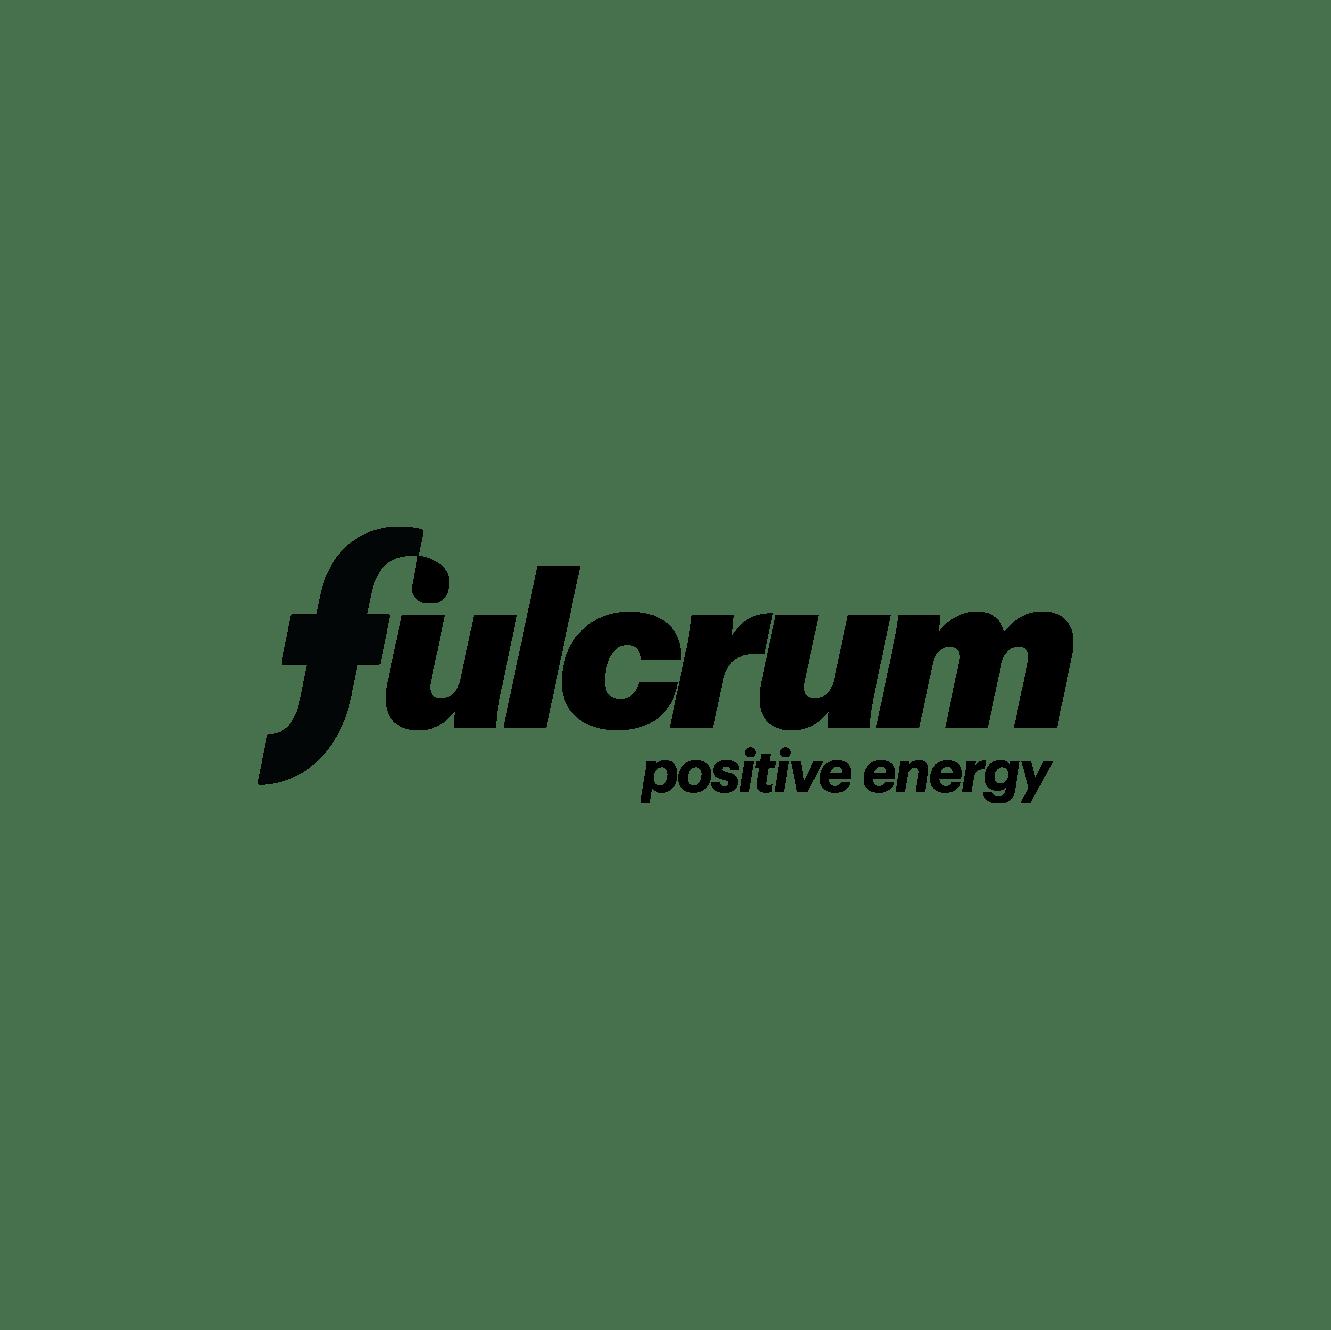 fulcrum_logosinitialselects_020419-66